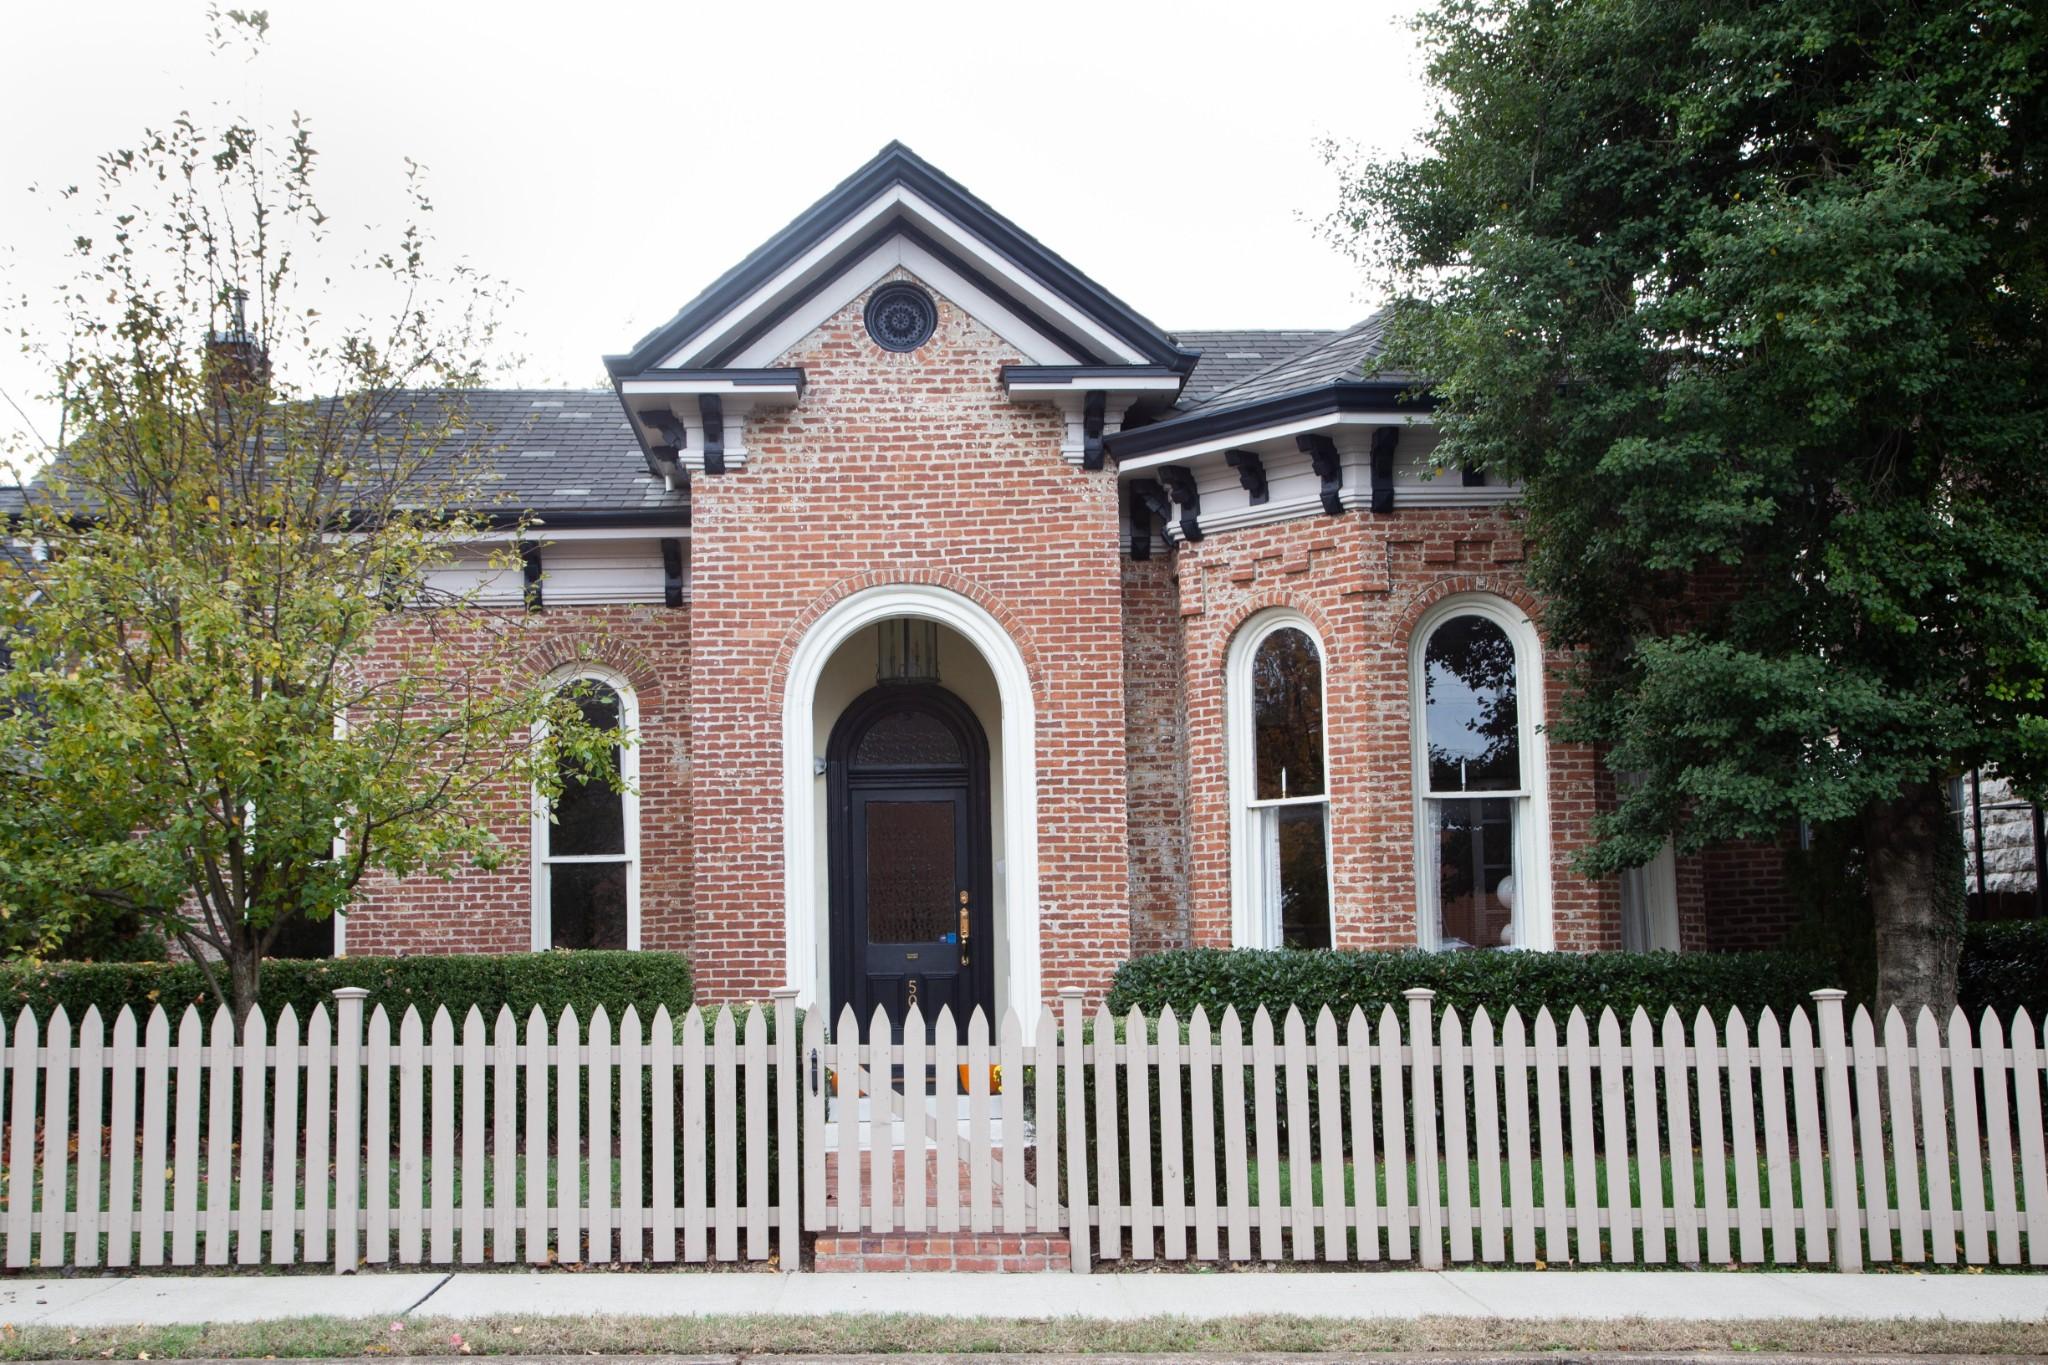 $1,800,000 - 4Br/5Ba -  for Sale in Historic Edgefield, Nashville